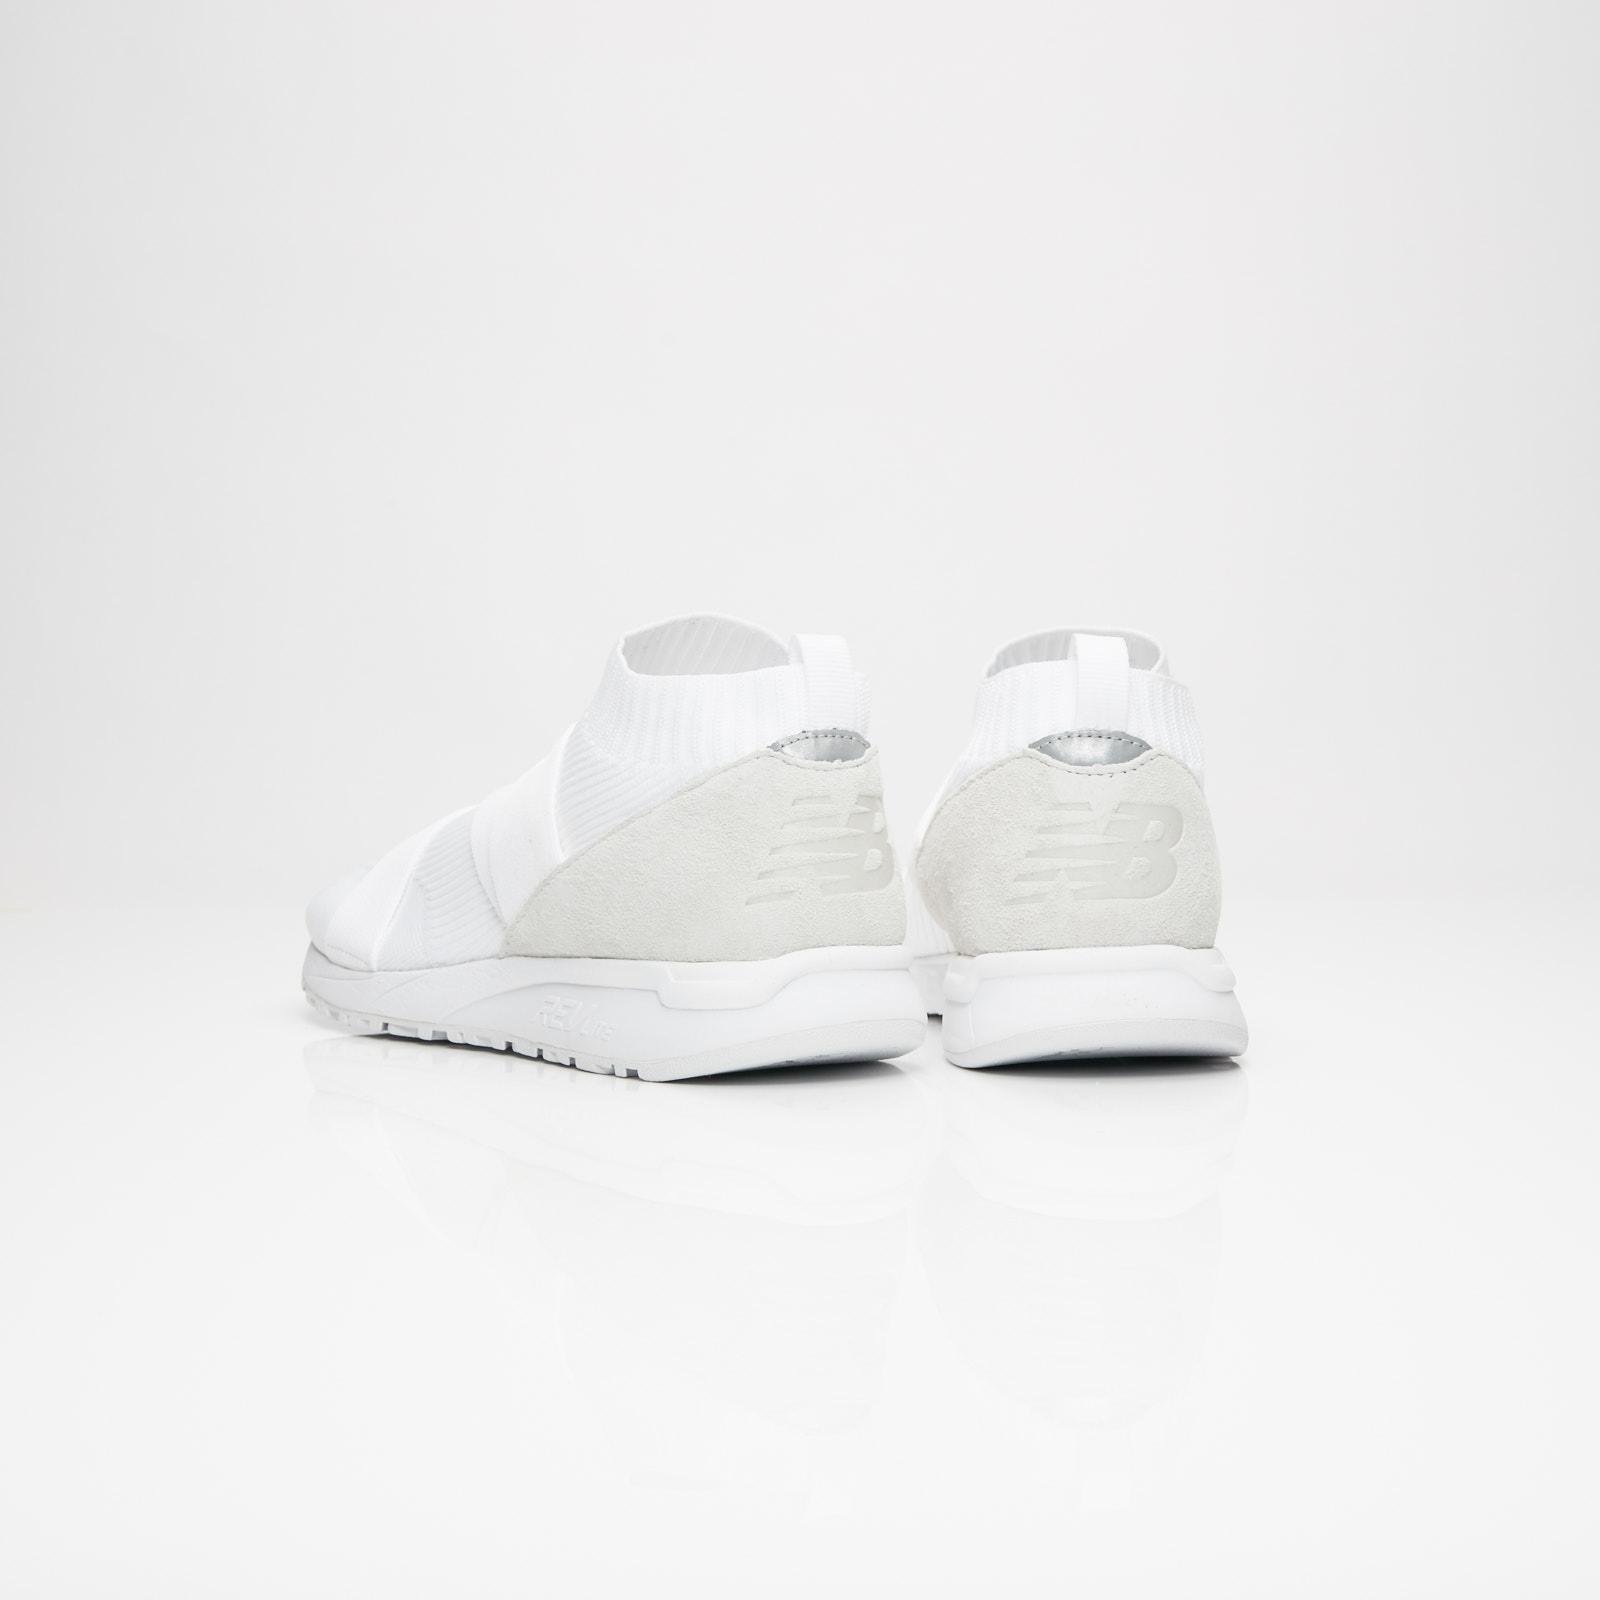 New Balance MRL247 Mrl247kw Sneakersnstuff | sneakers